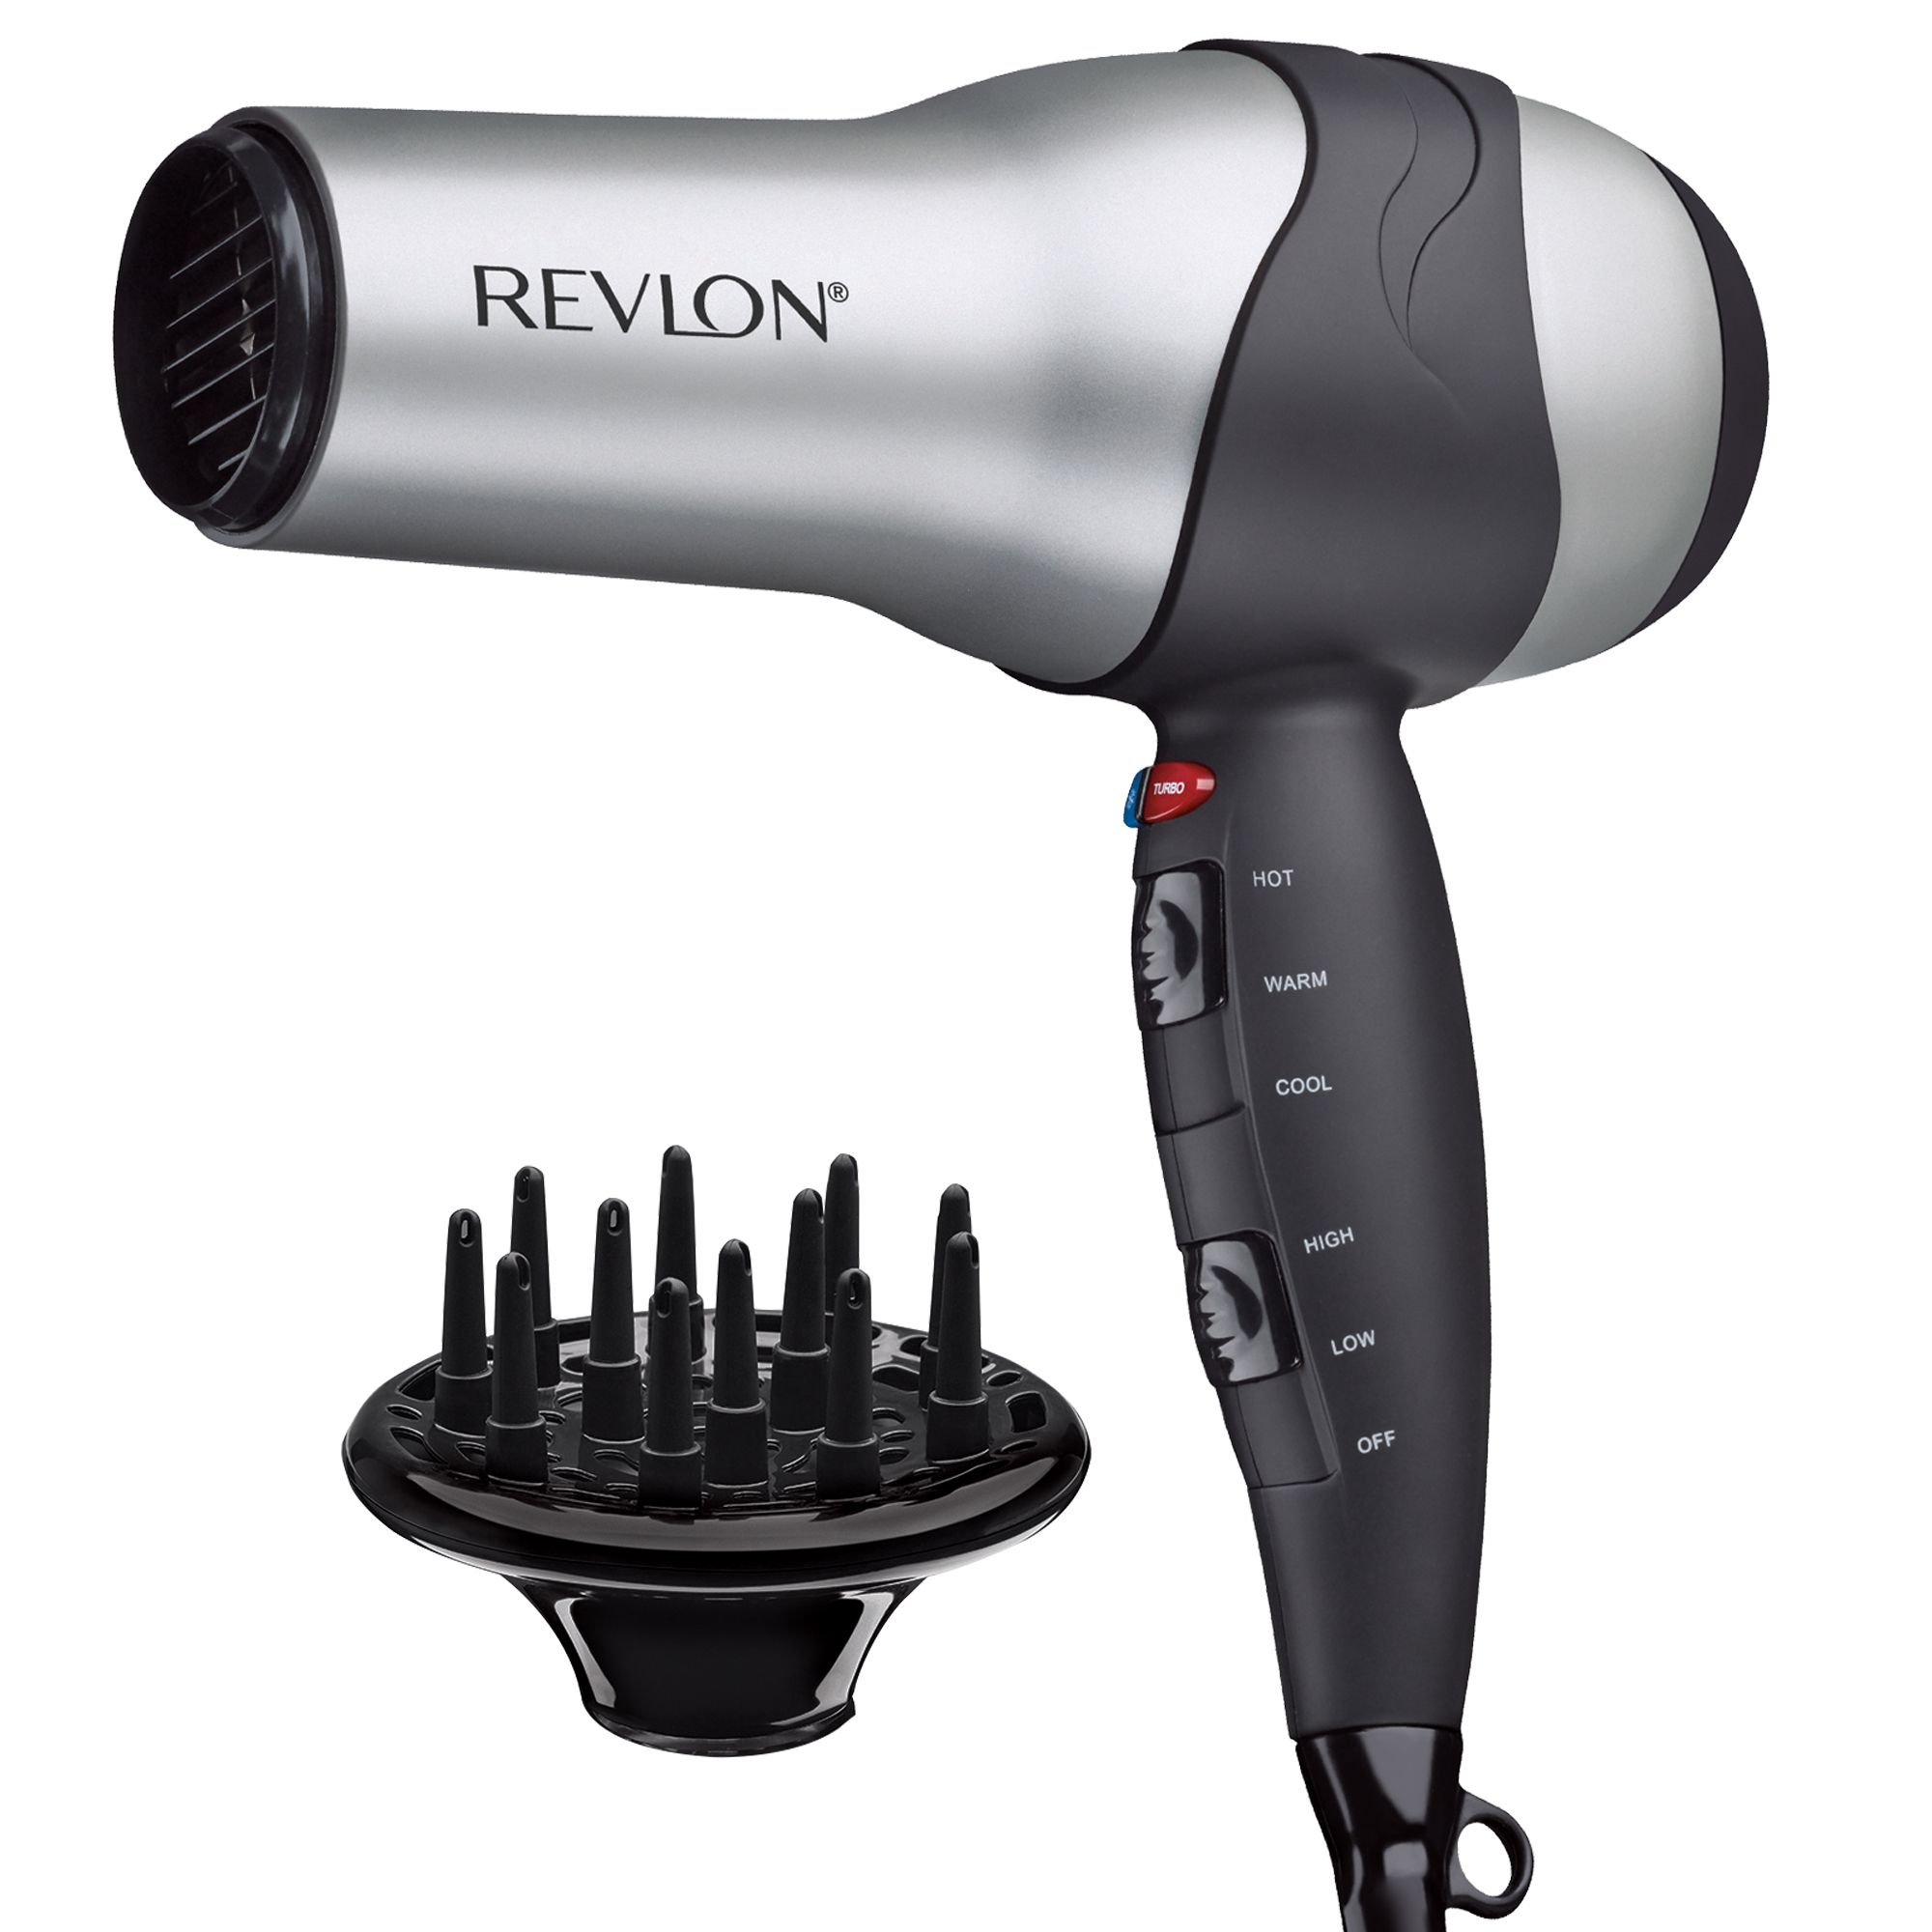 Revlon Hair Dryer 1875W Turbo Styler 3 Heat/2 Speed